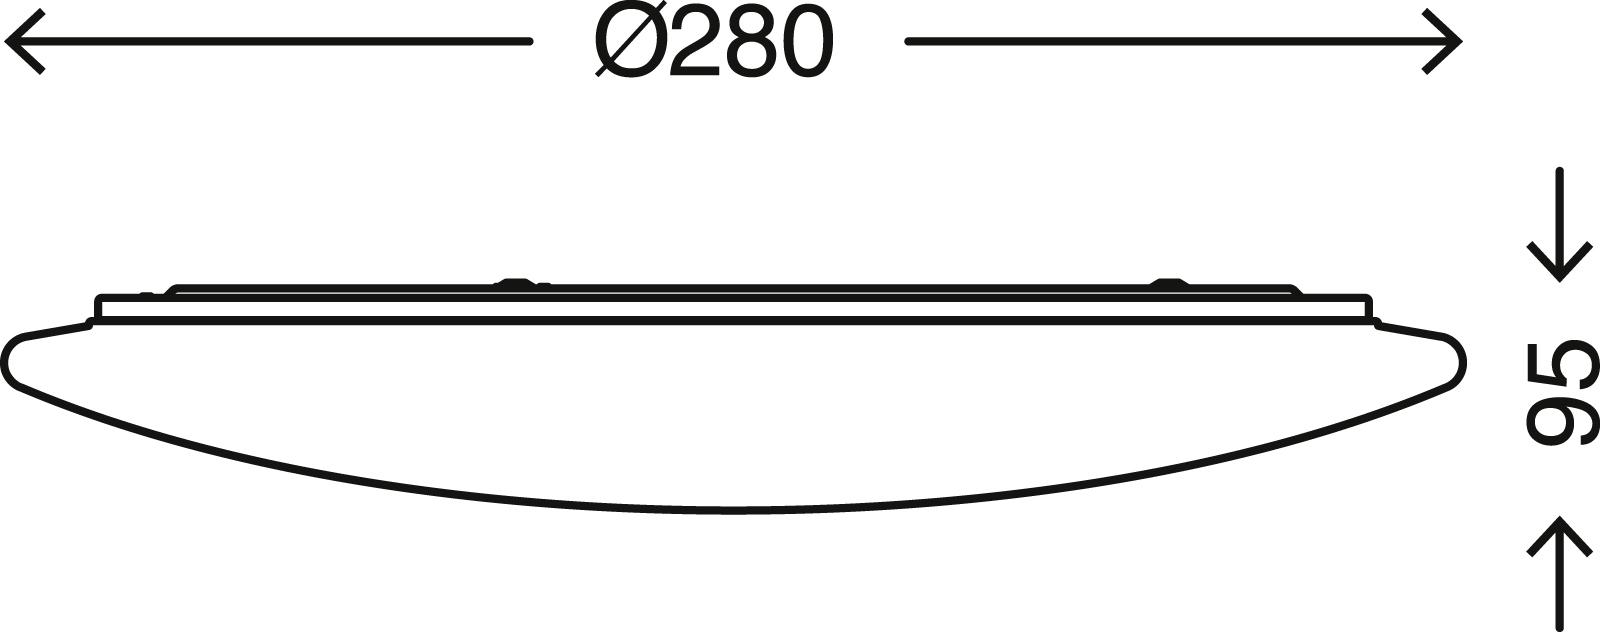 TELEFUNKEN Sensor LED Deckenleuchte, Ø 28 cm, 20 W, Weiss